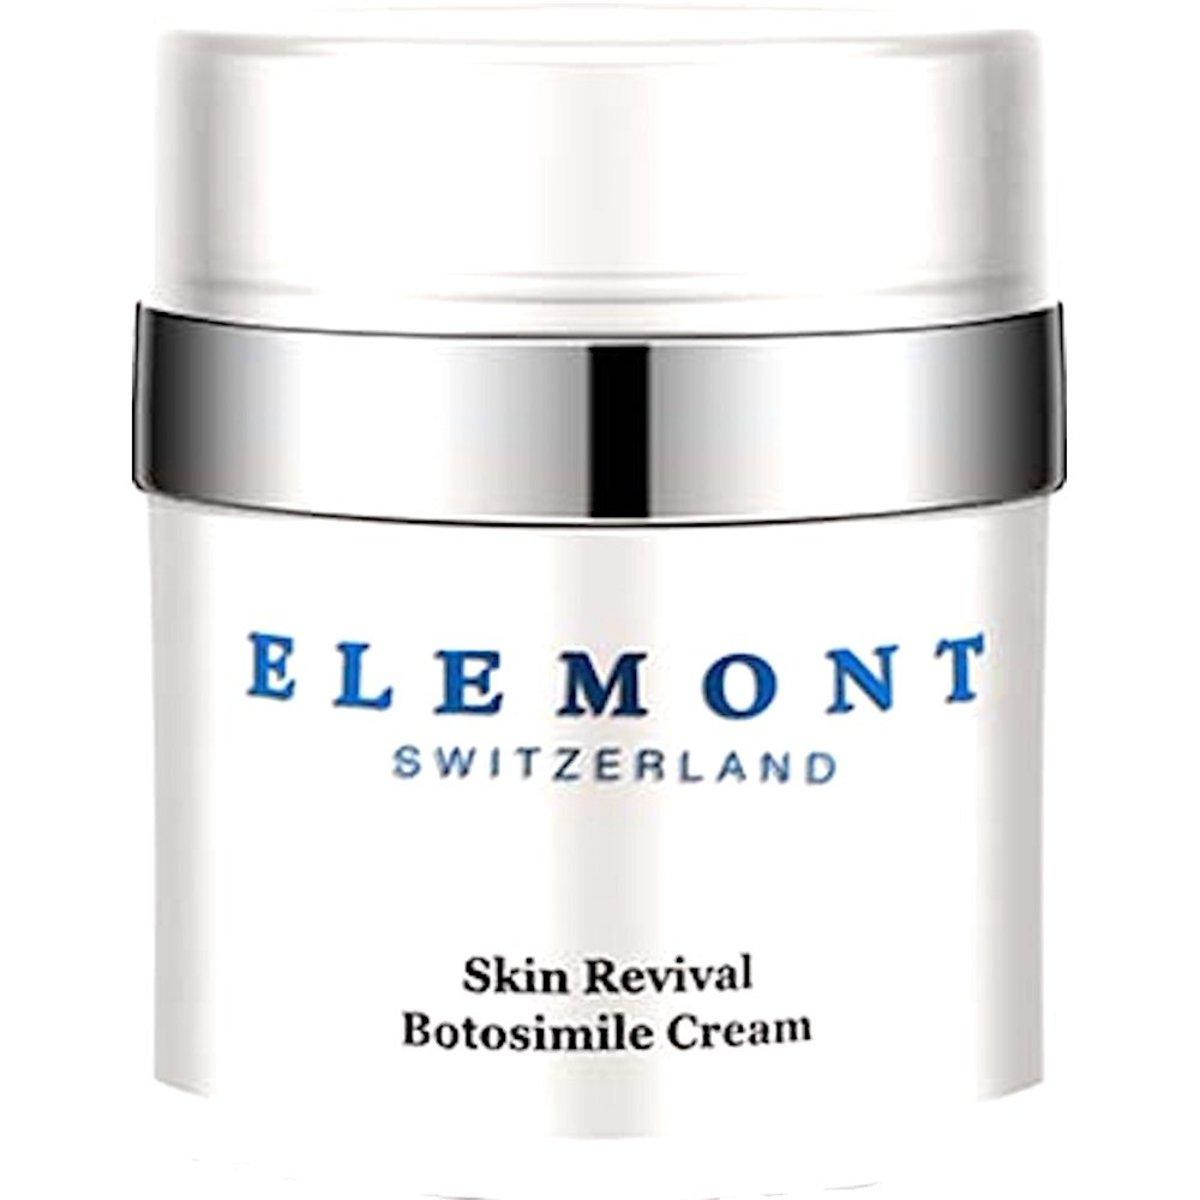 Skin Revival Botosimile Cream